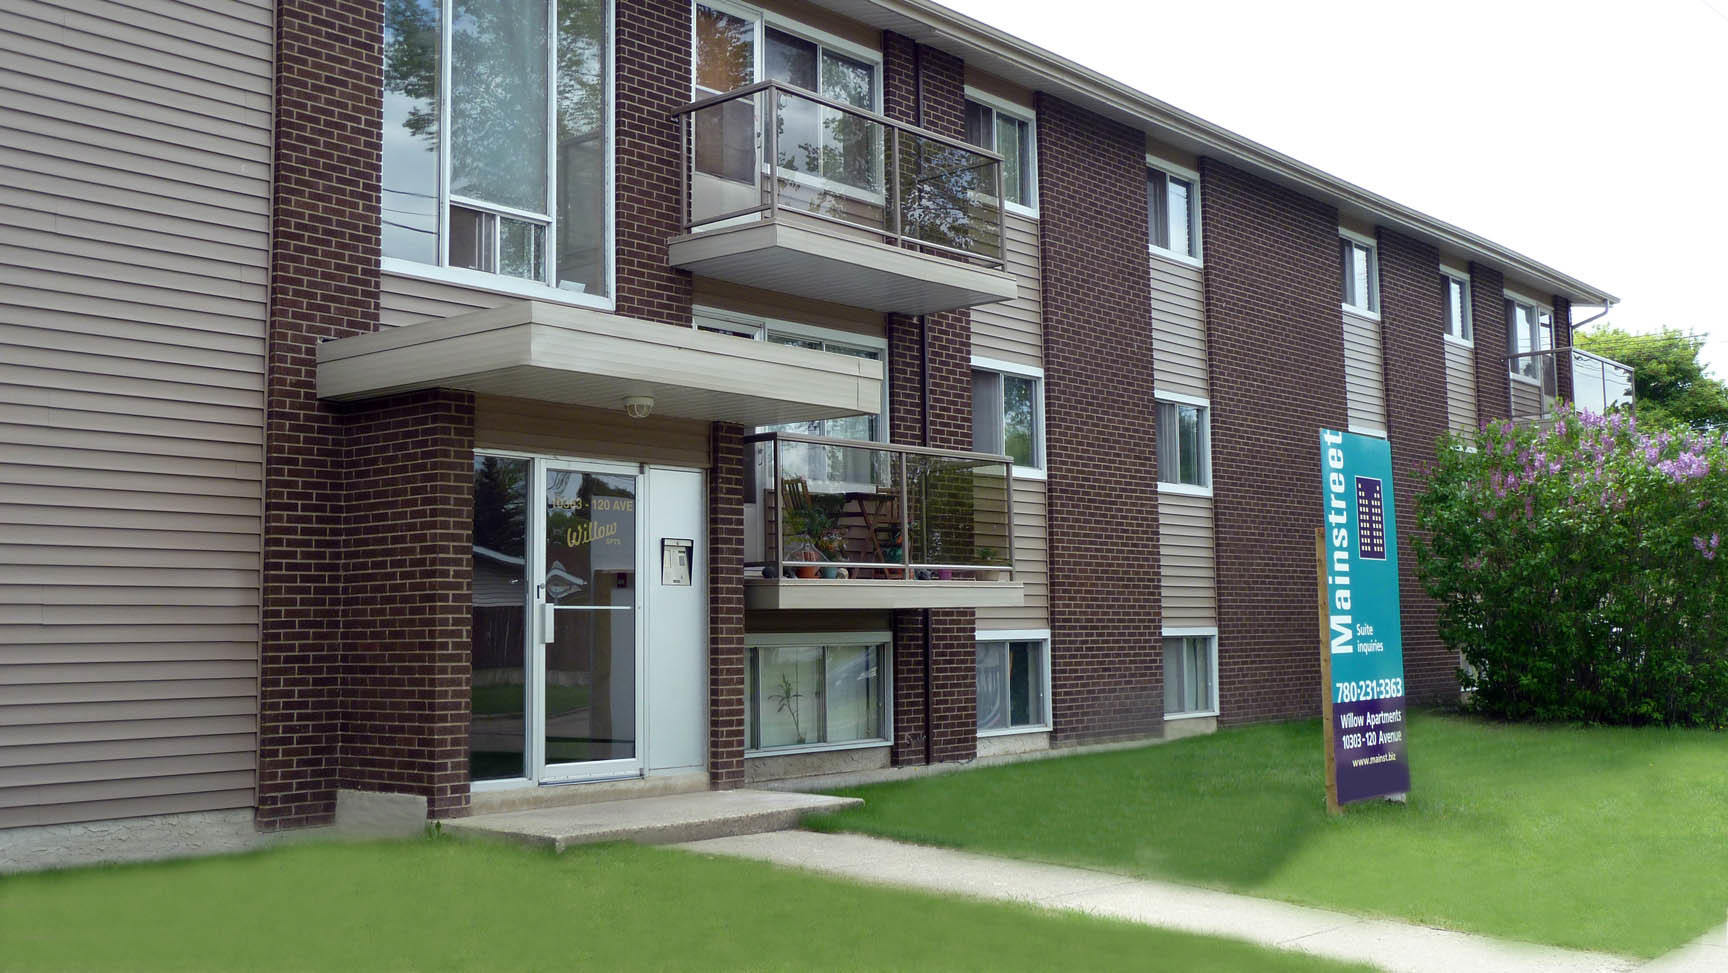 10303 120 Avenue NW, Edmonton, AB - $849